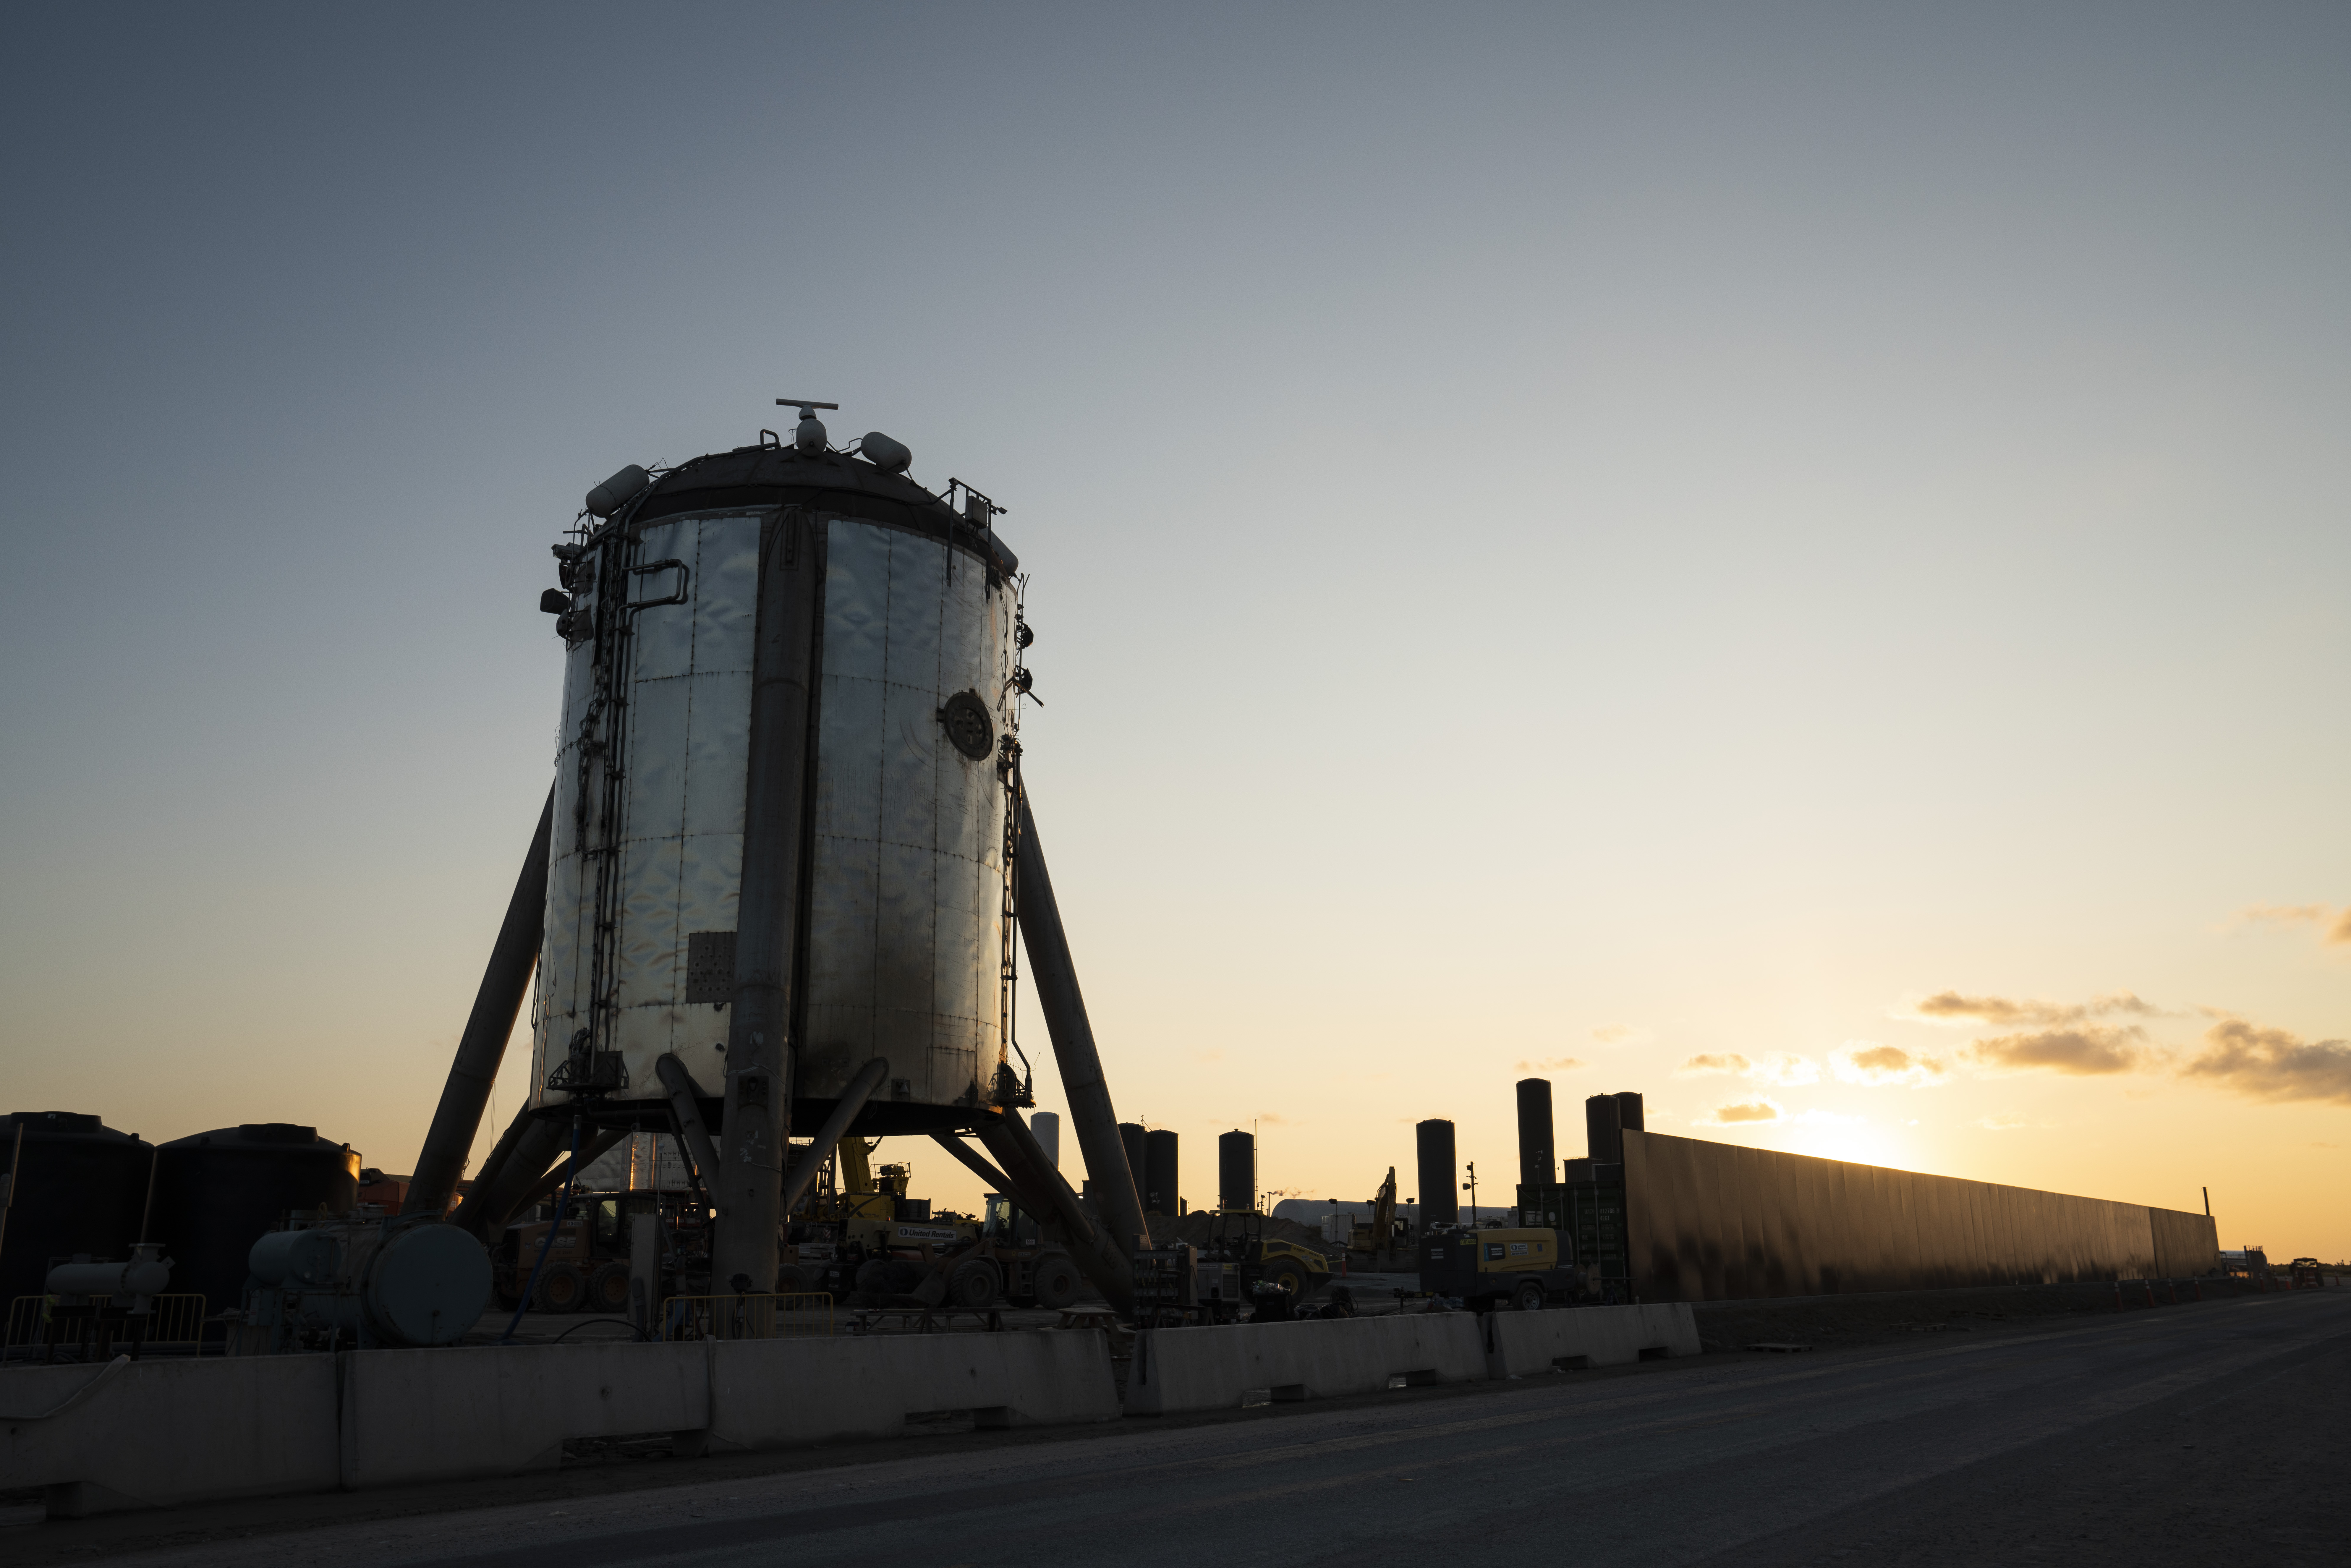 A Starship prototype in Boca Chica